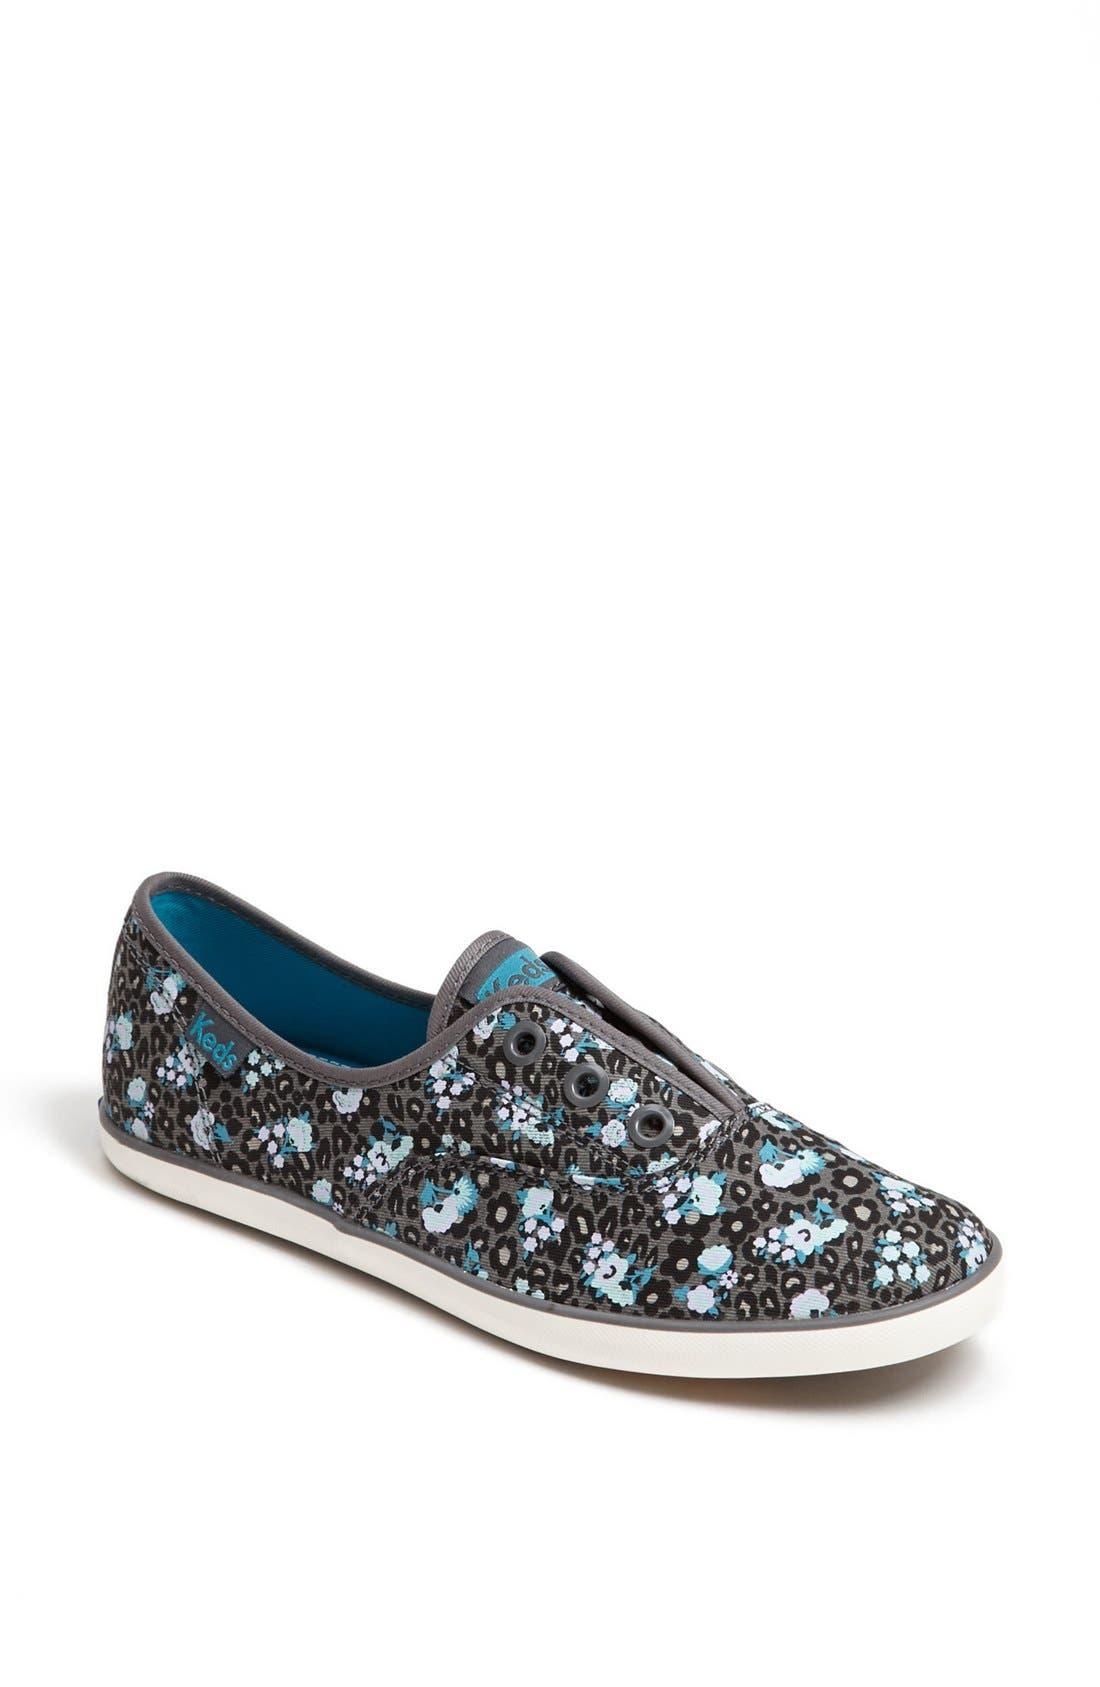 Alternate Image 1 Selected - Keds® 'Rookie - Leopard Floral' Laceless Sneaker (Women)